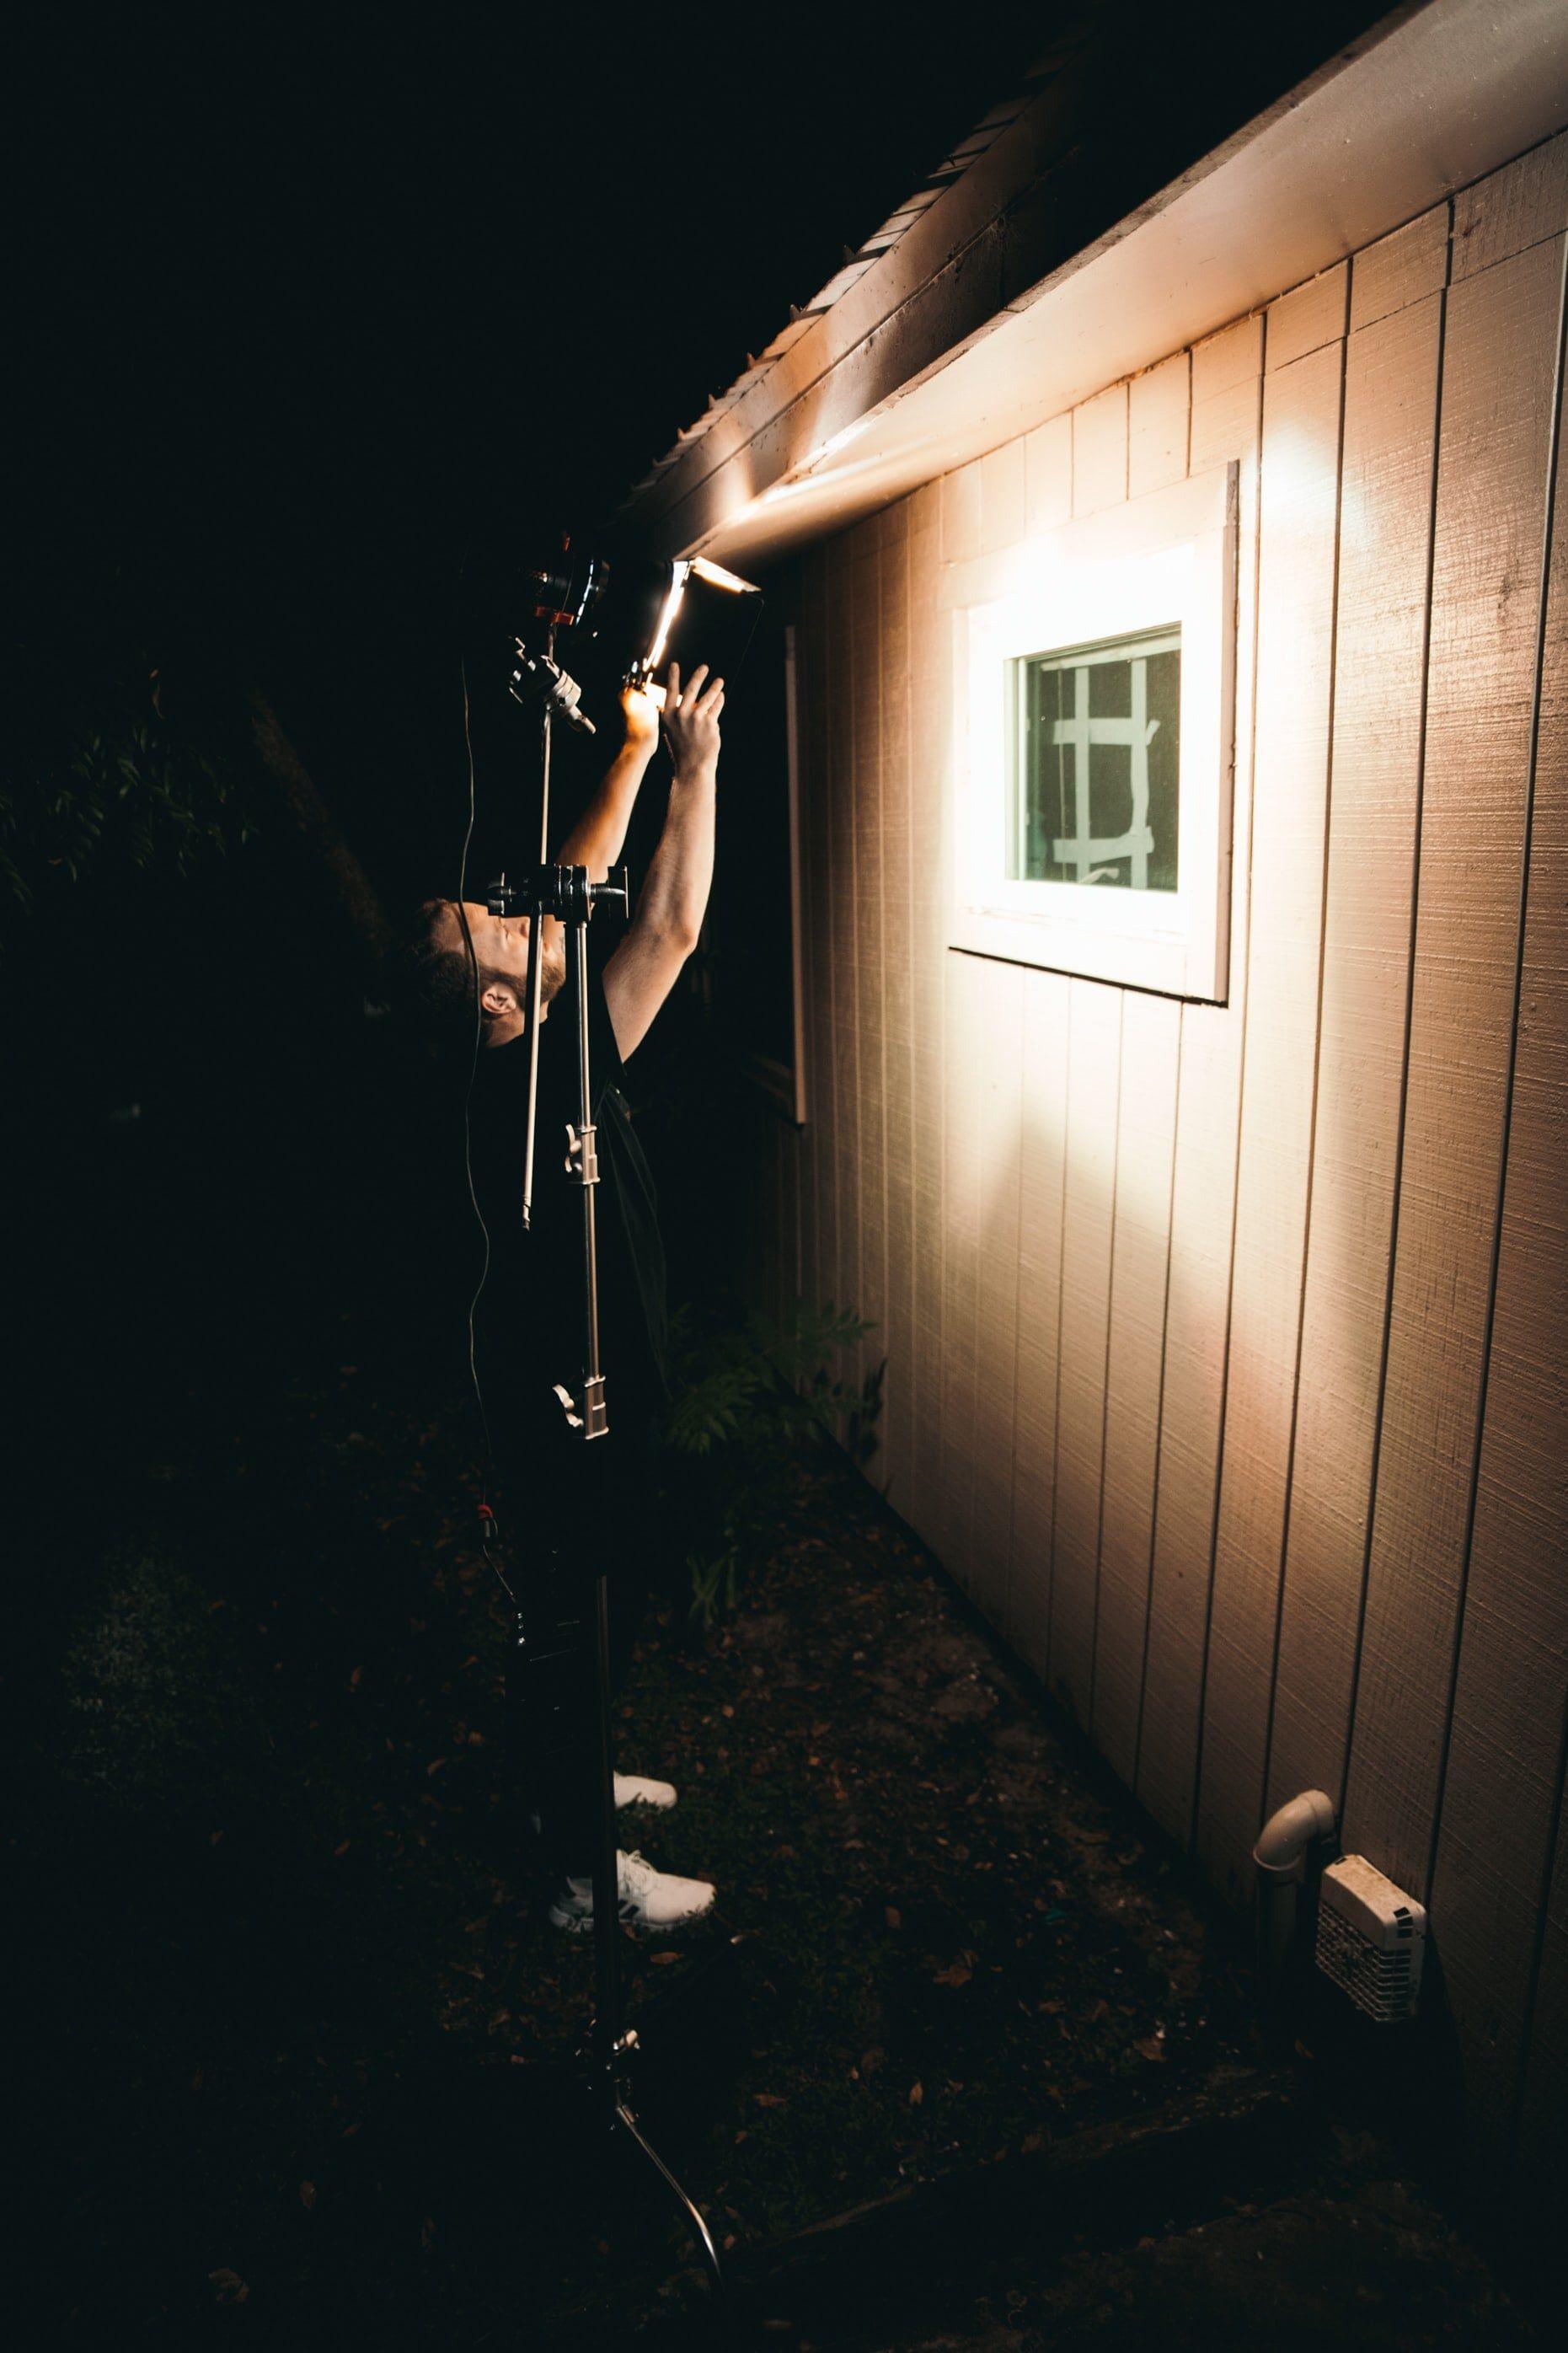 man-lighting-a-window-from-outside